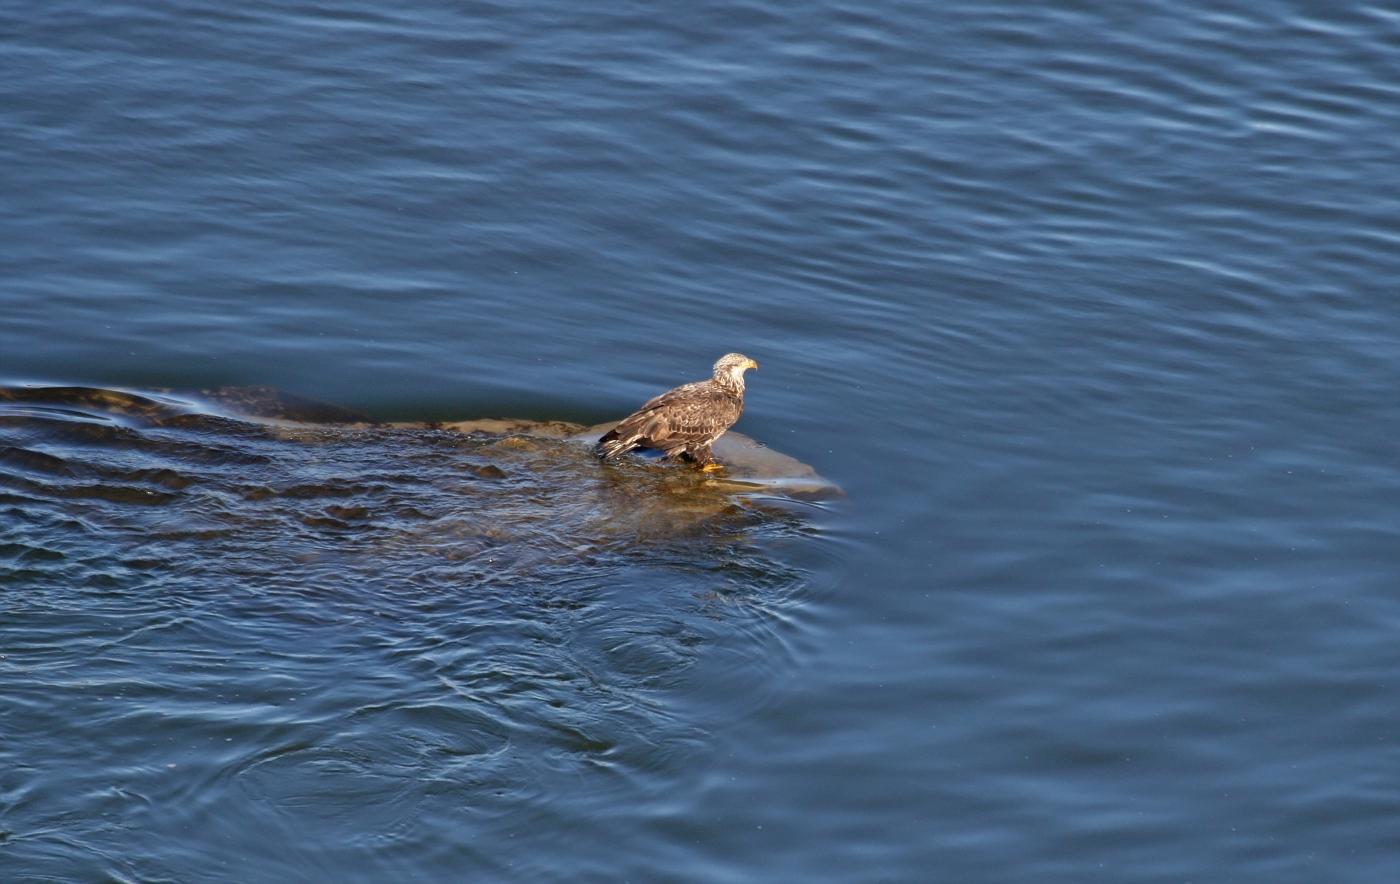 Juvenile Bald Eagle on the Rocks